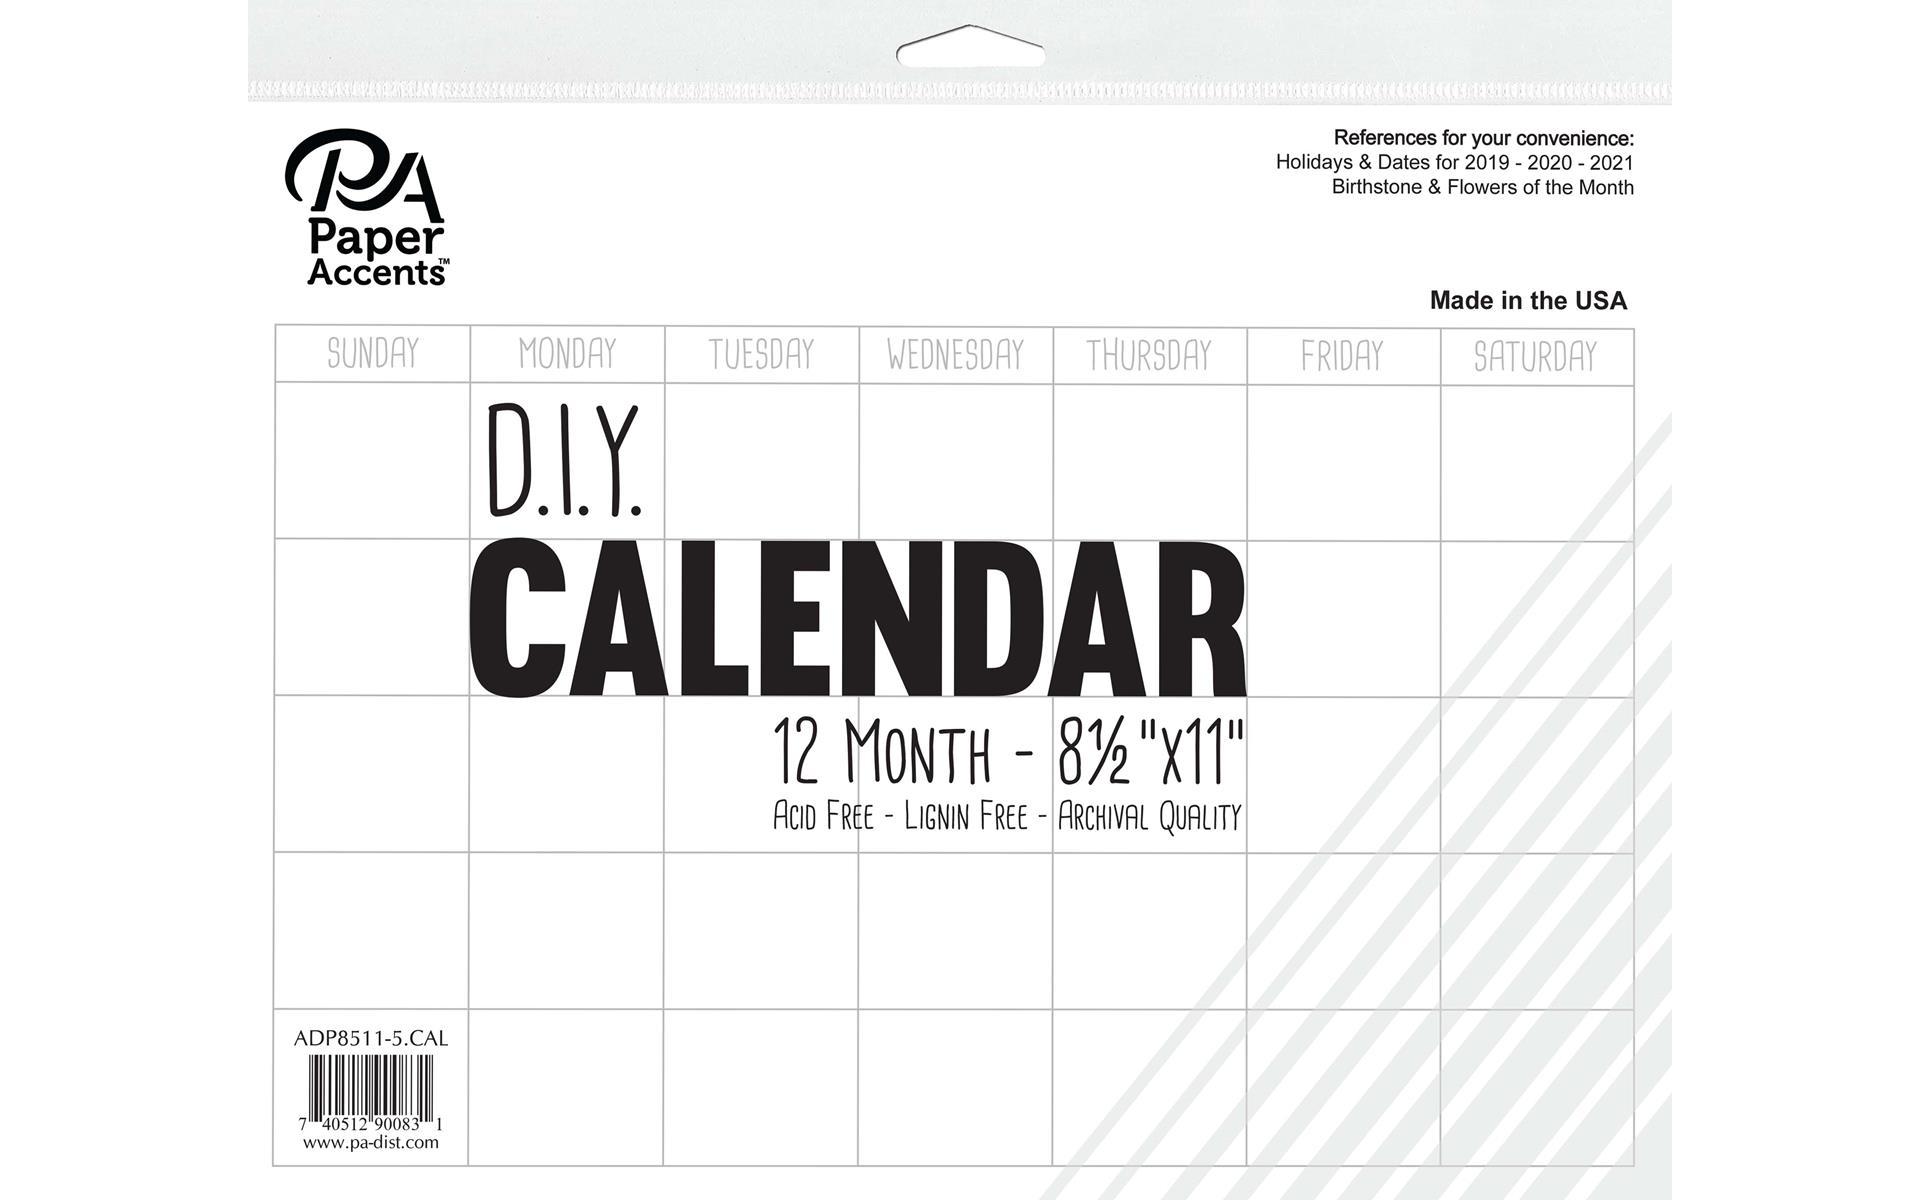 Diy Calendar 8.5X11 12 Month Blank White